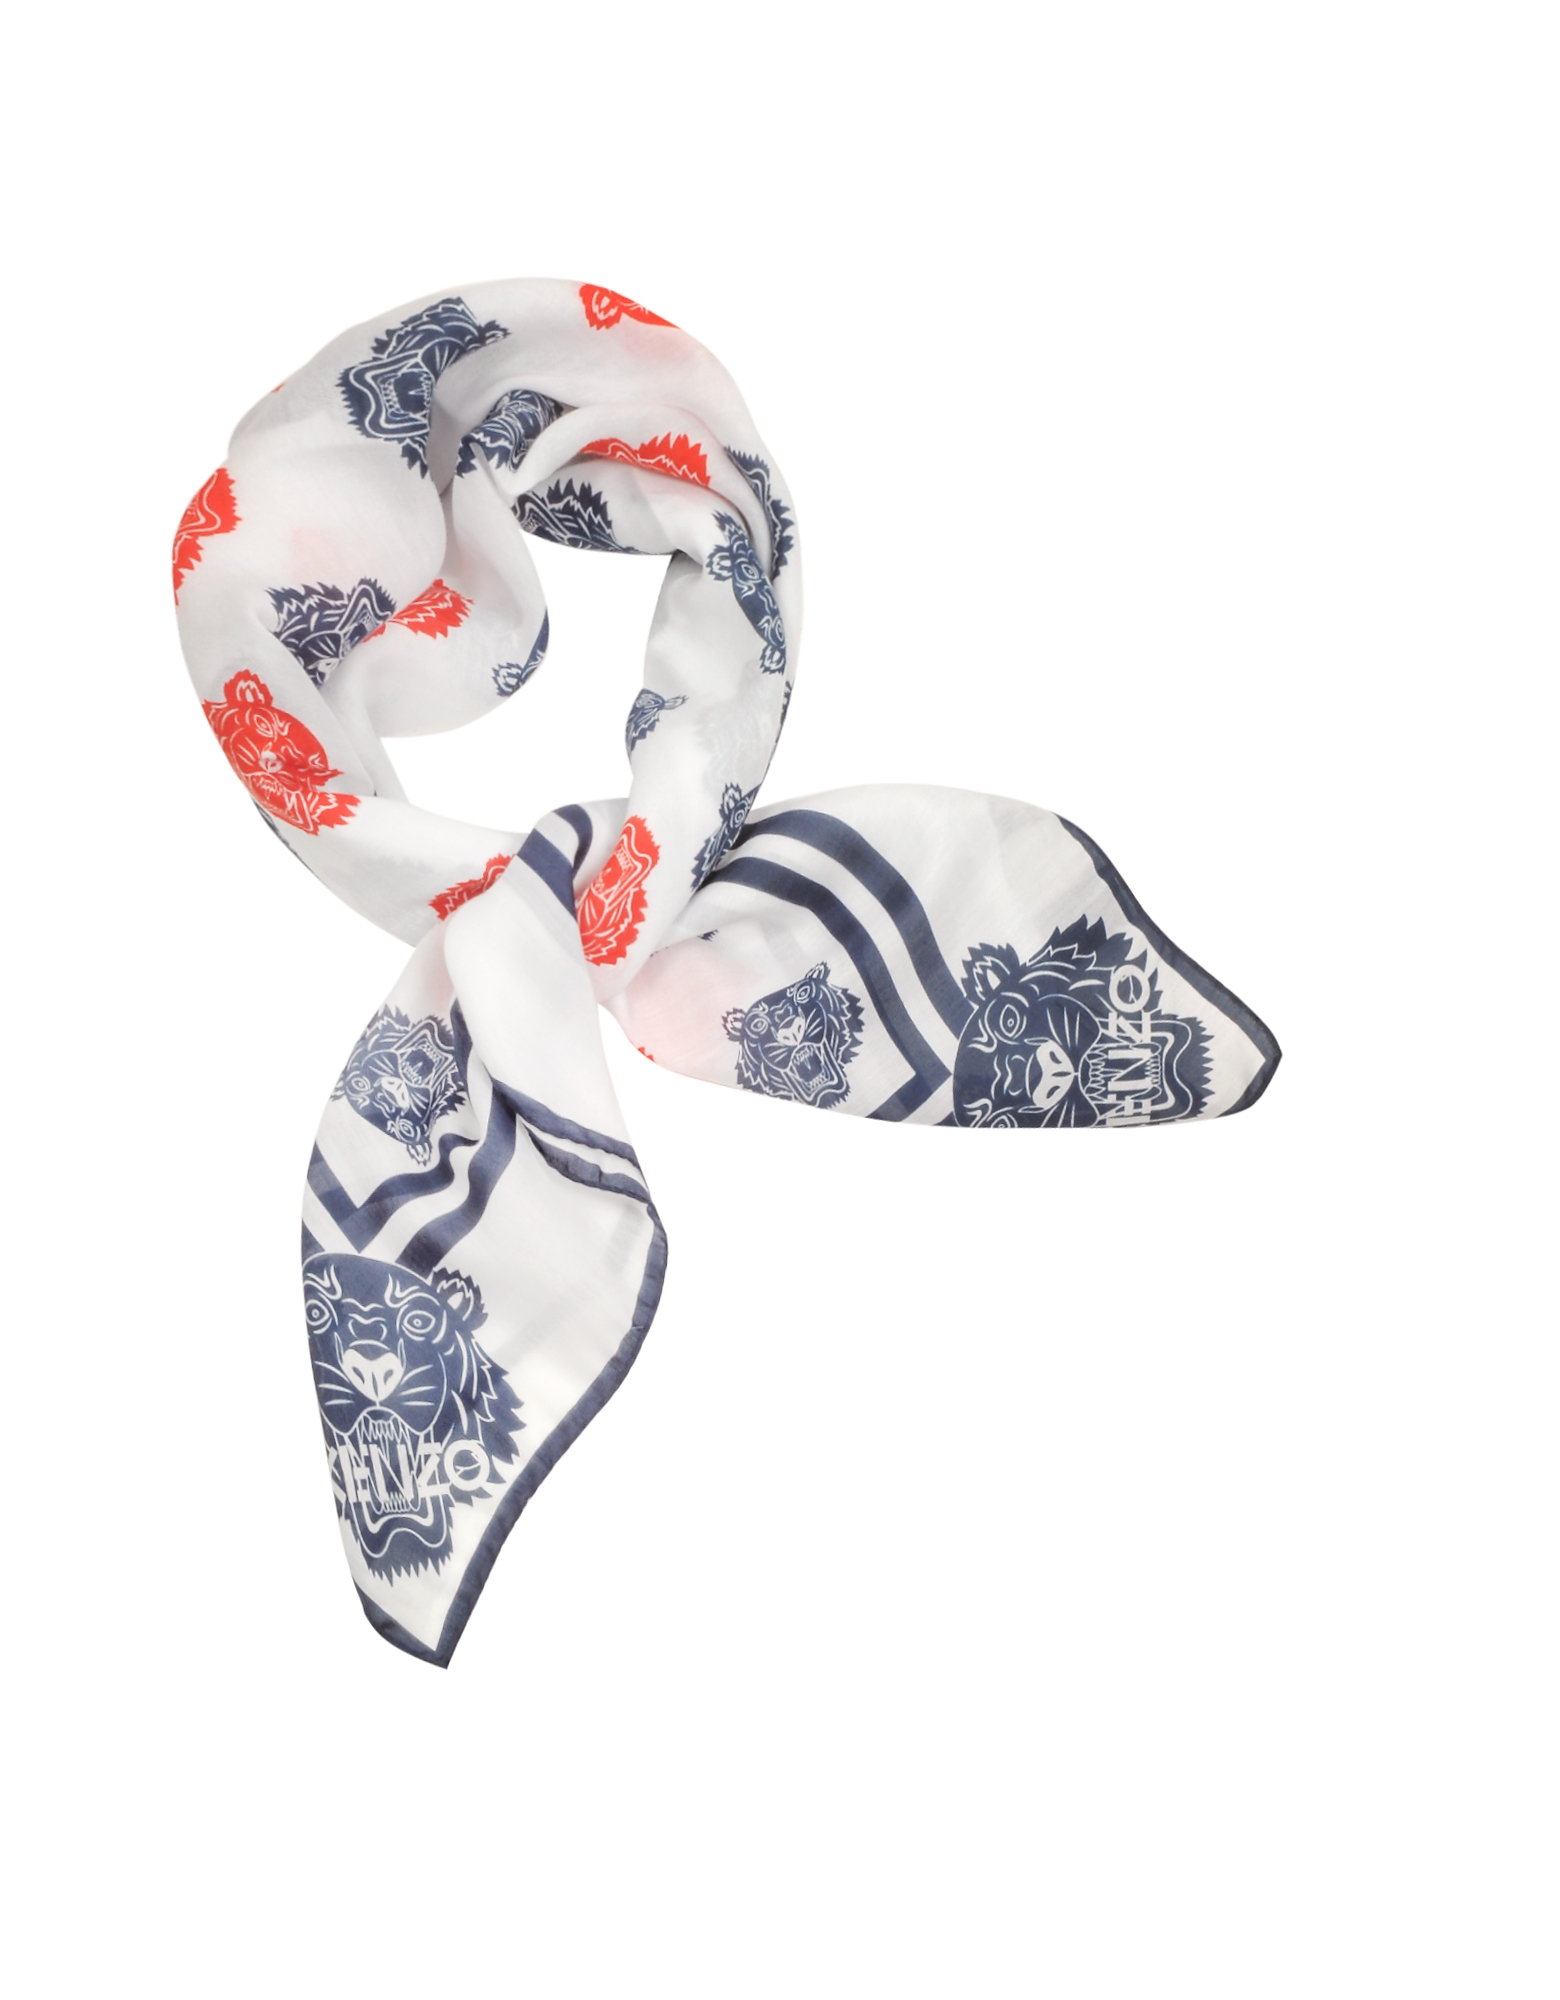 Kenzo Bandanas, Cotton and Silk Printed Tiger Bandana